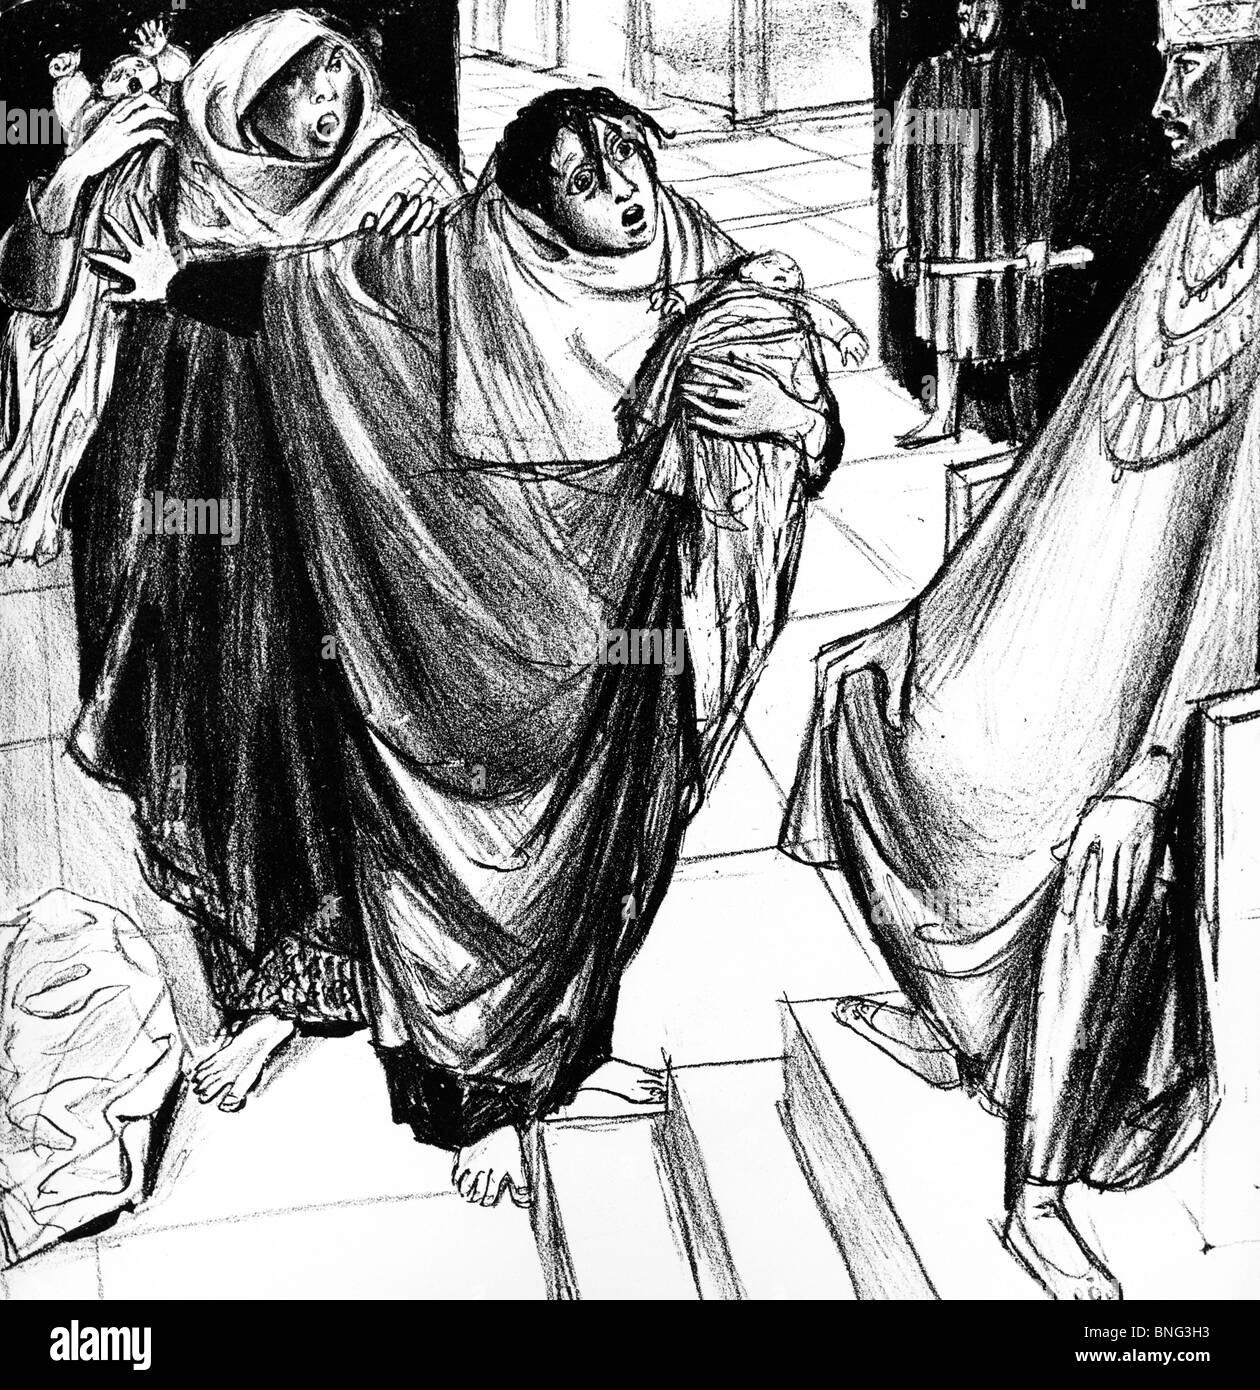 Solomon's Judgment by Felix Hoffmann - Stock Image